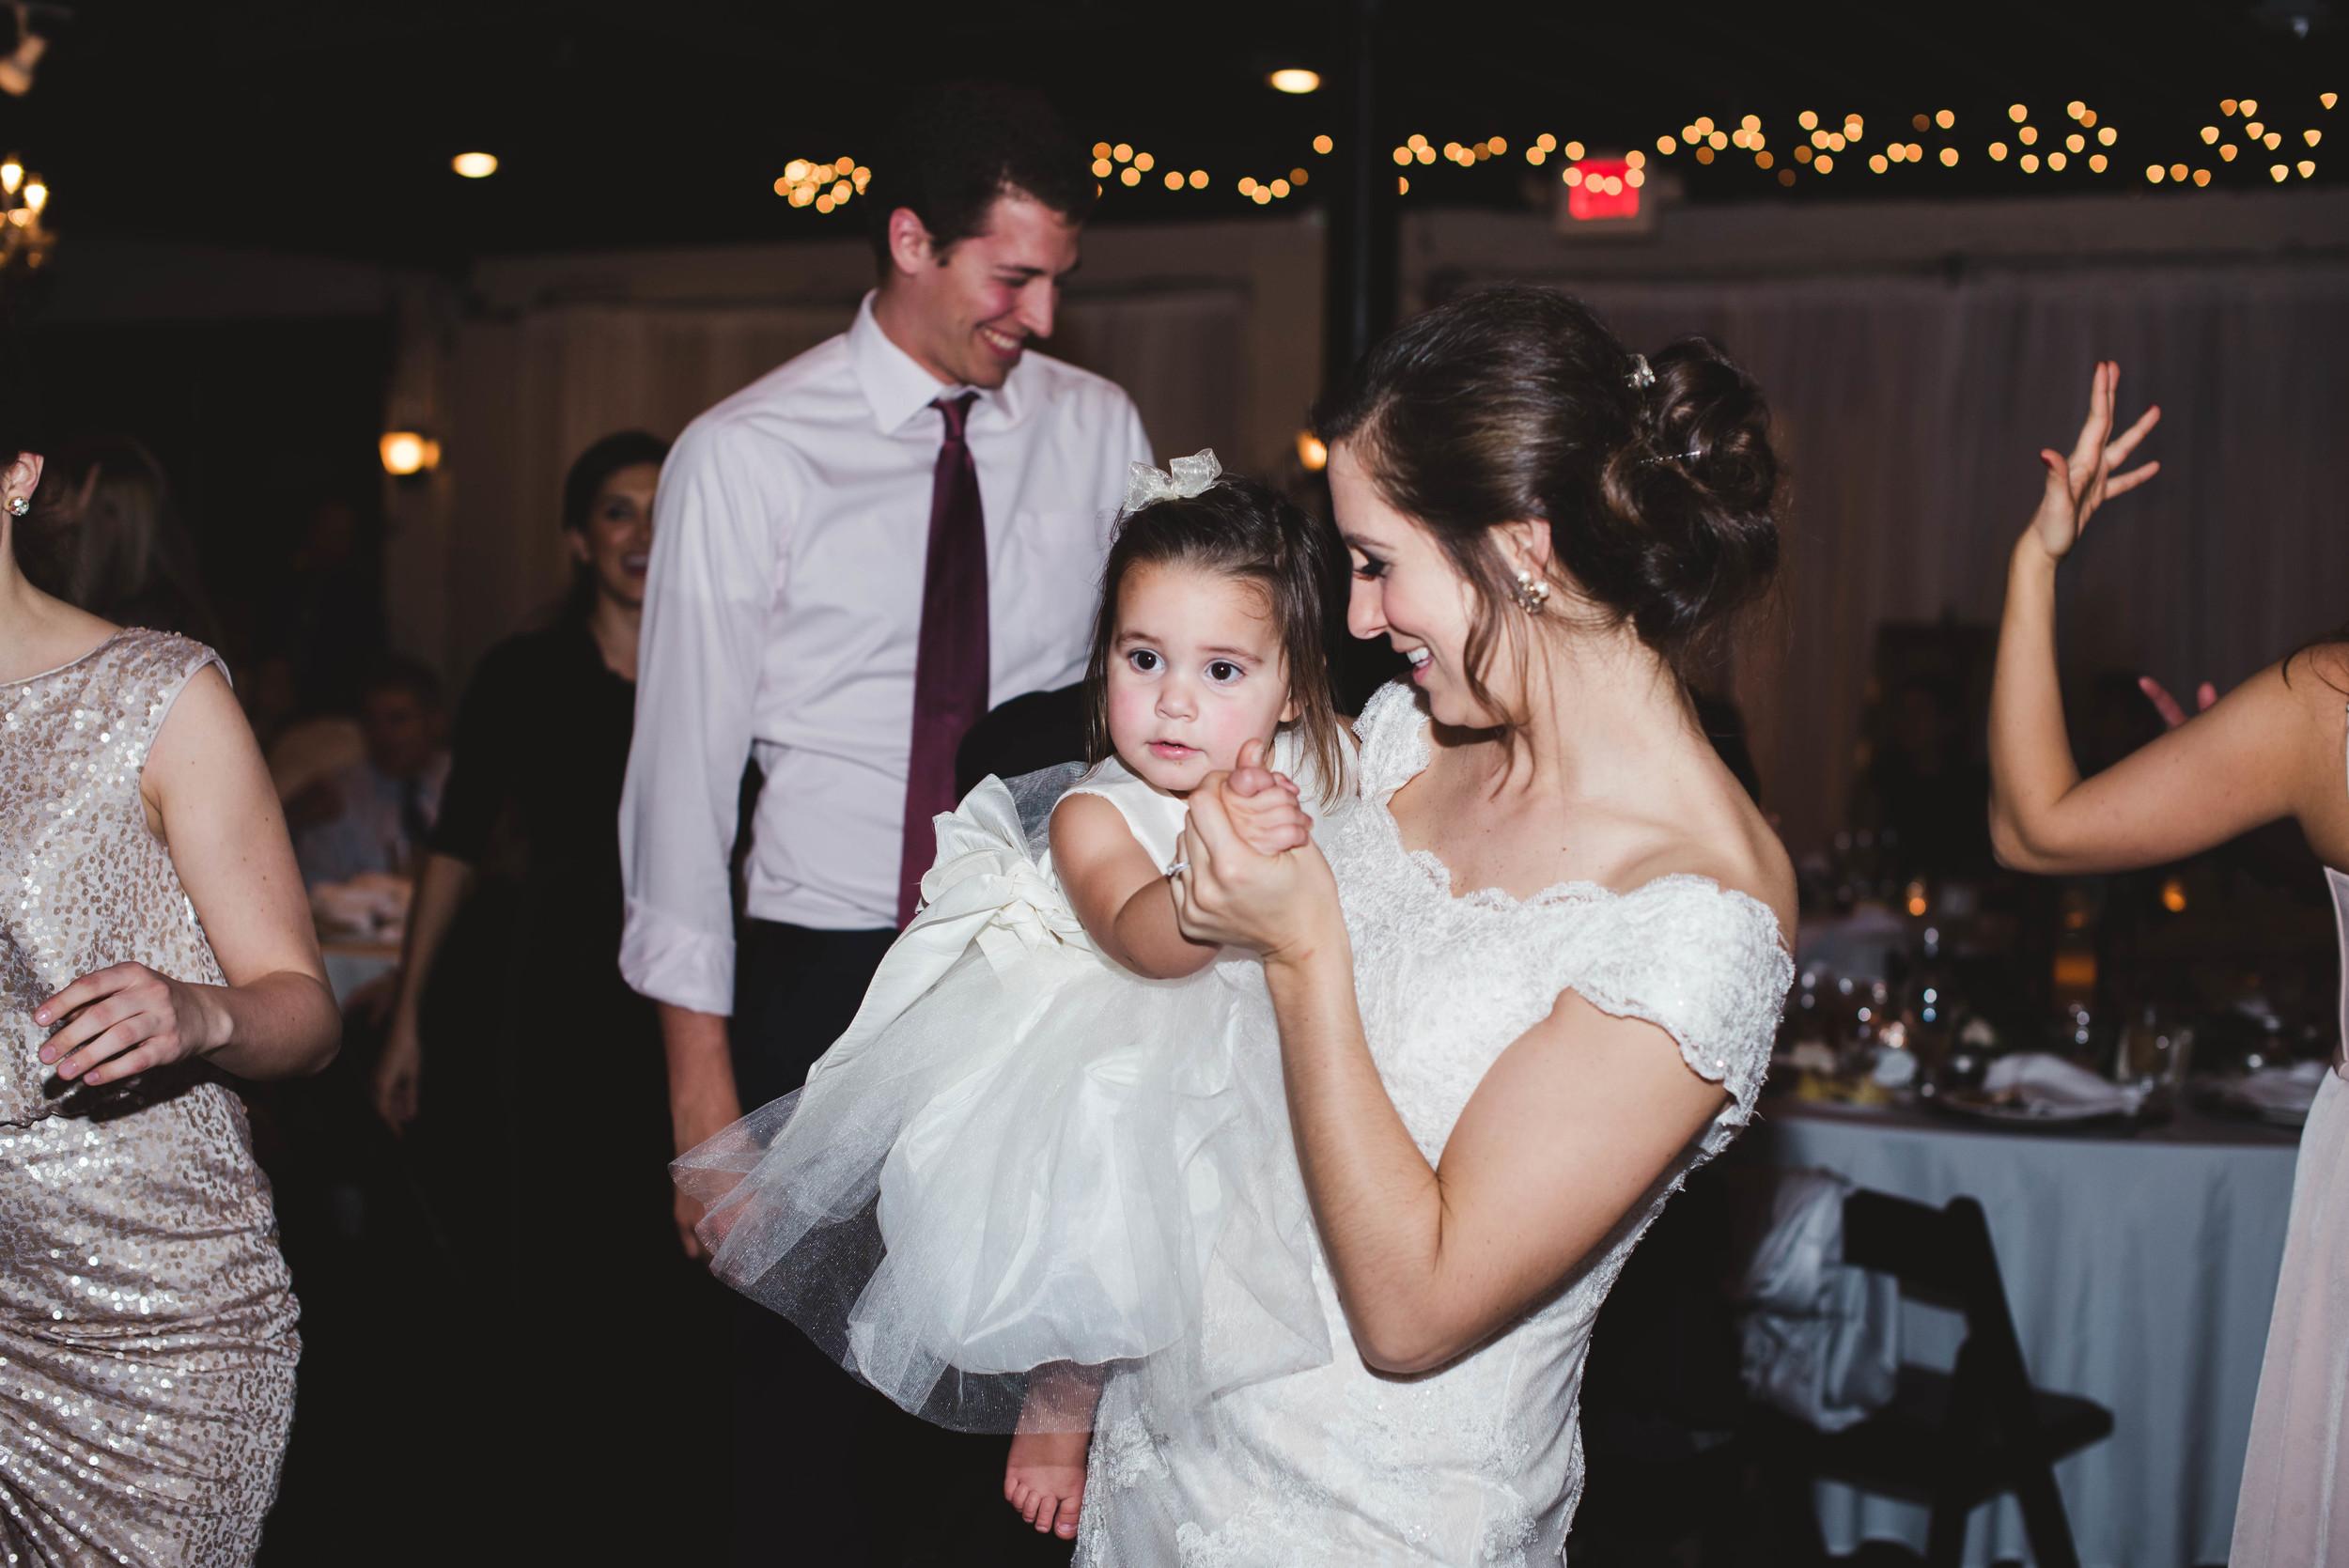 Souther wedding-14.jpg